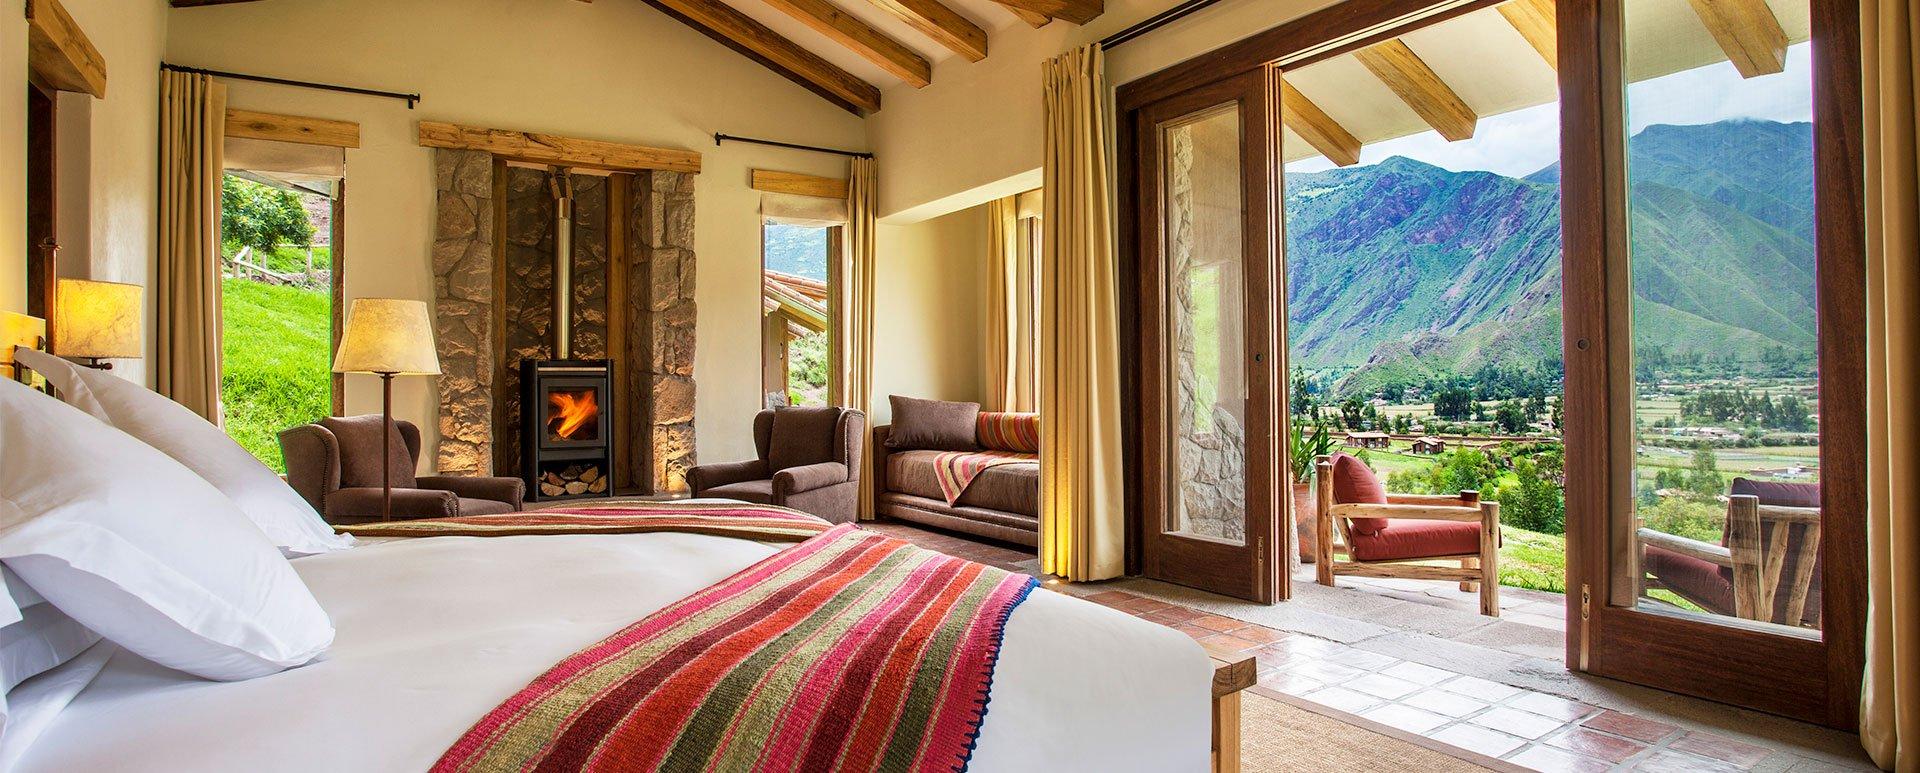 Hacienda Urubamba Suite